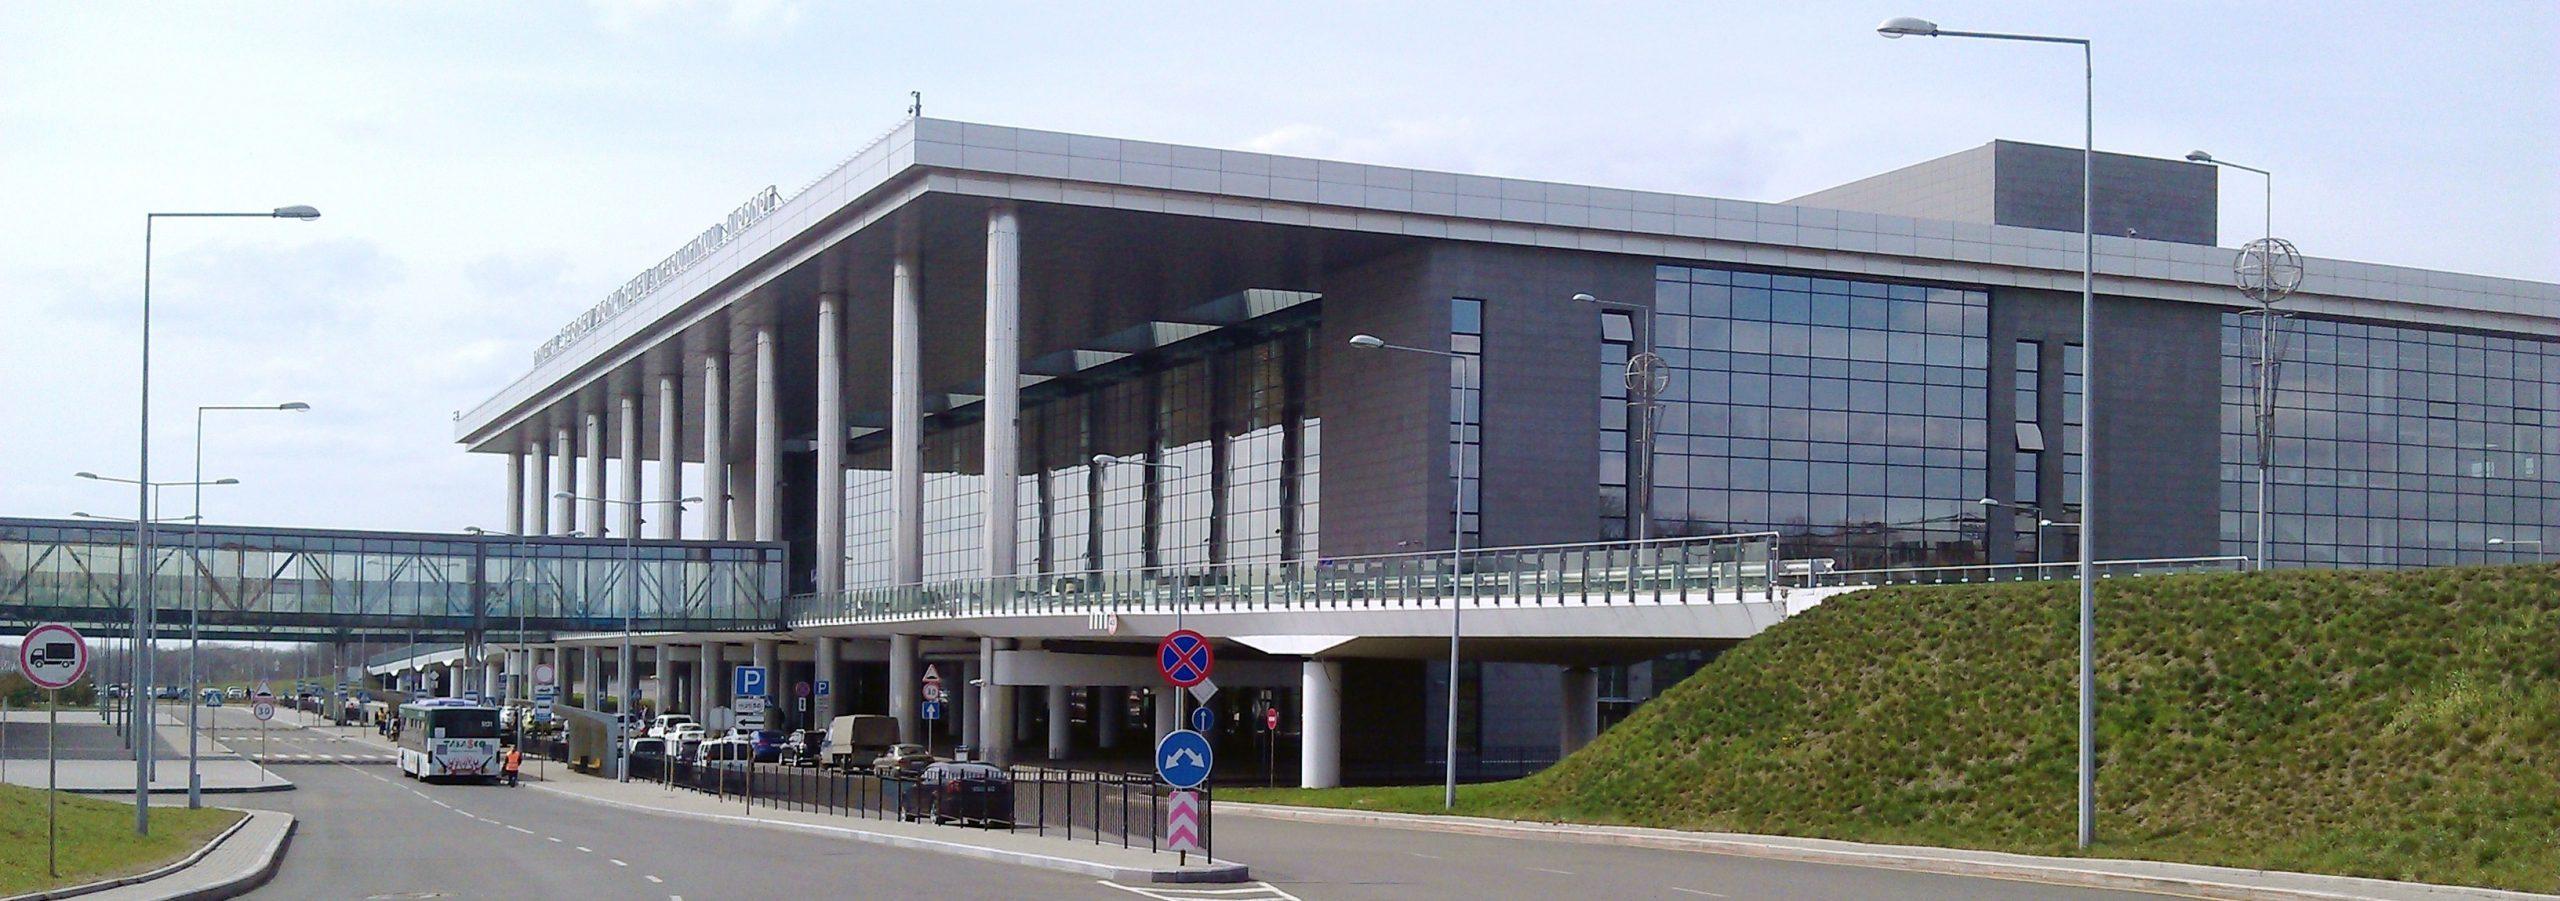 مطار دونيتسك